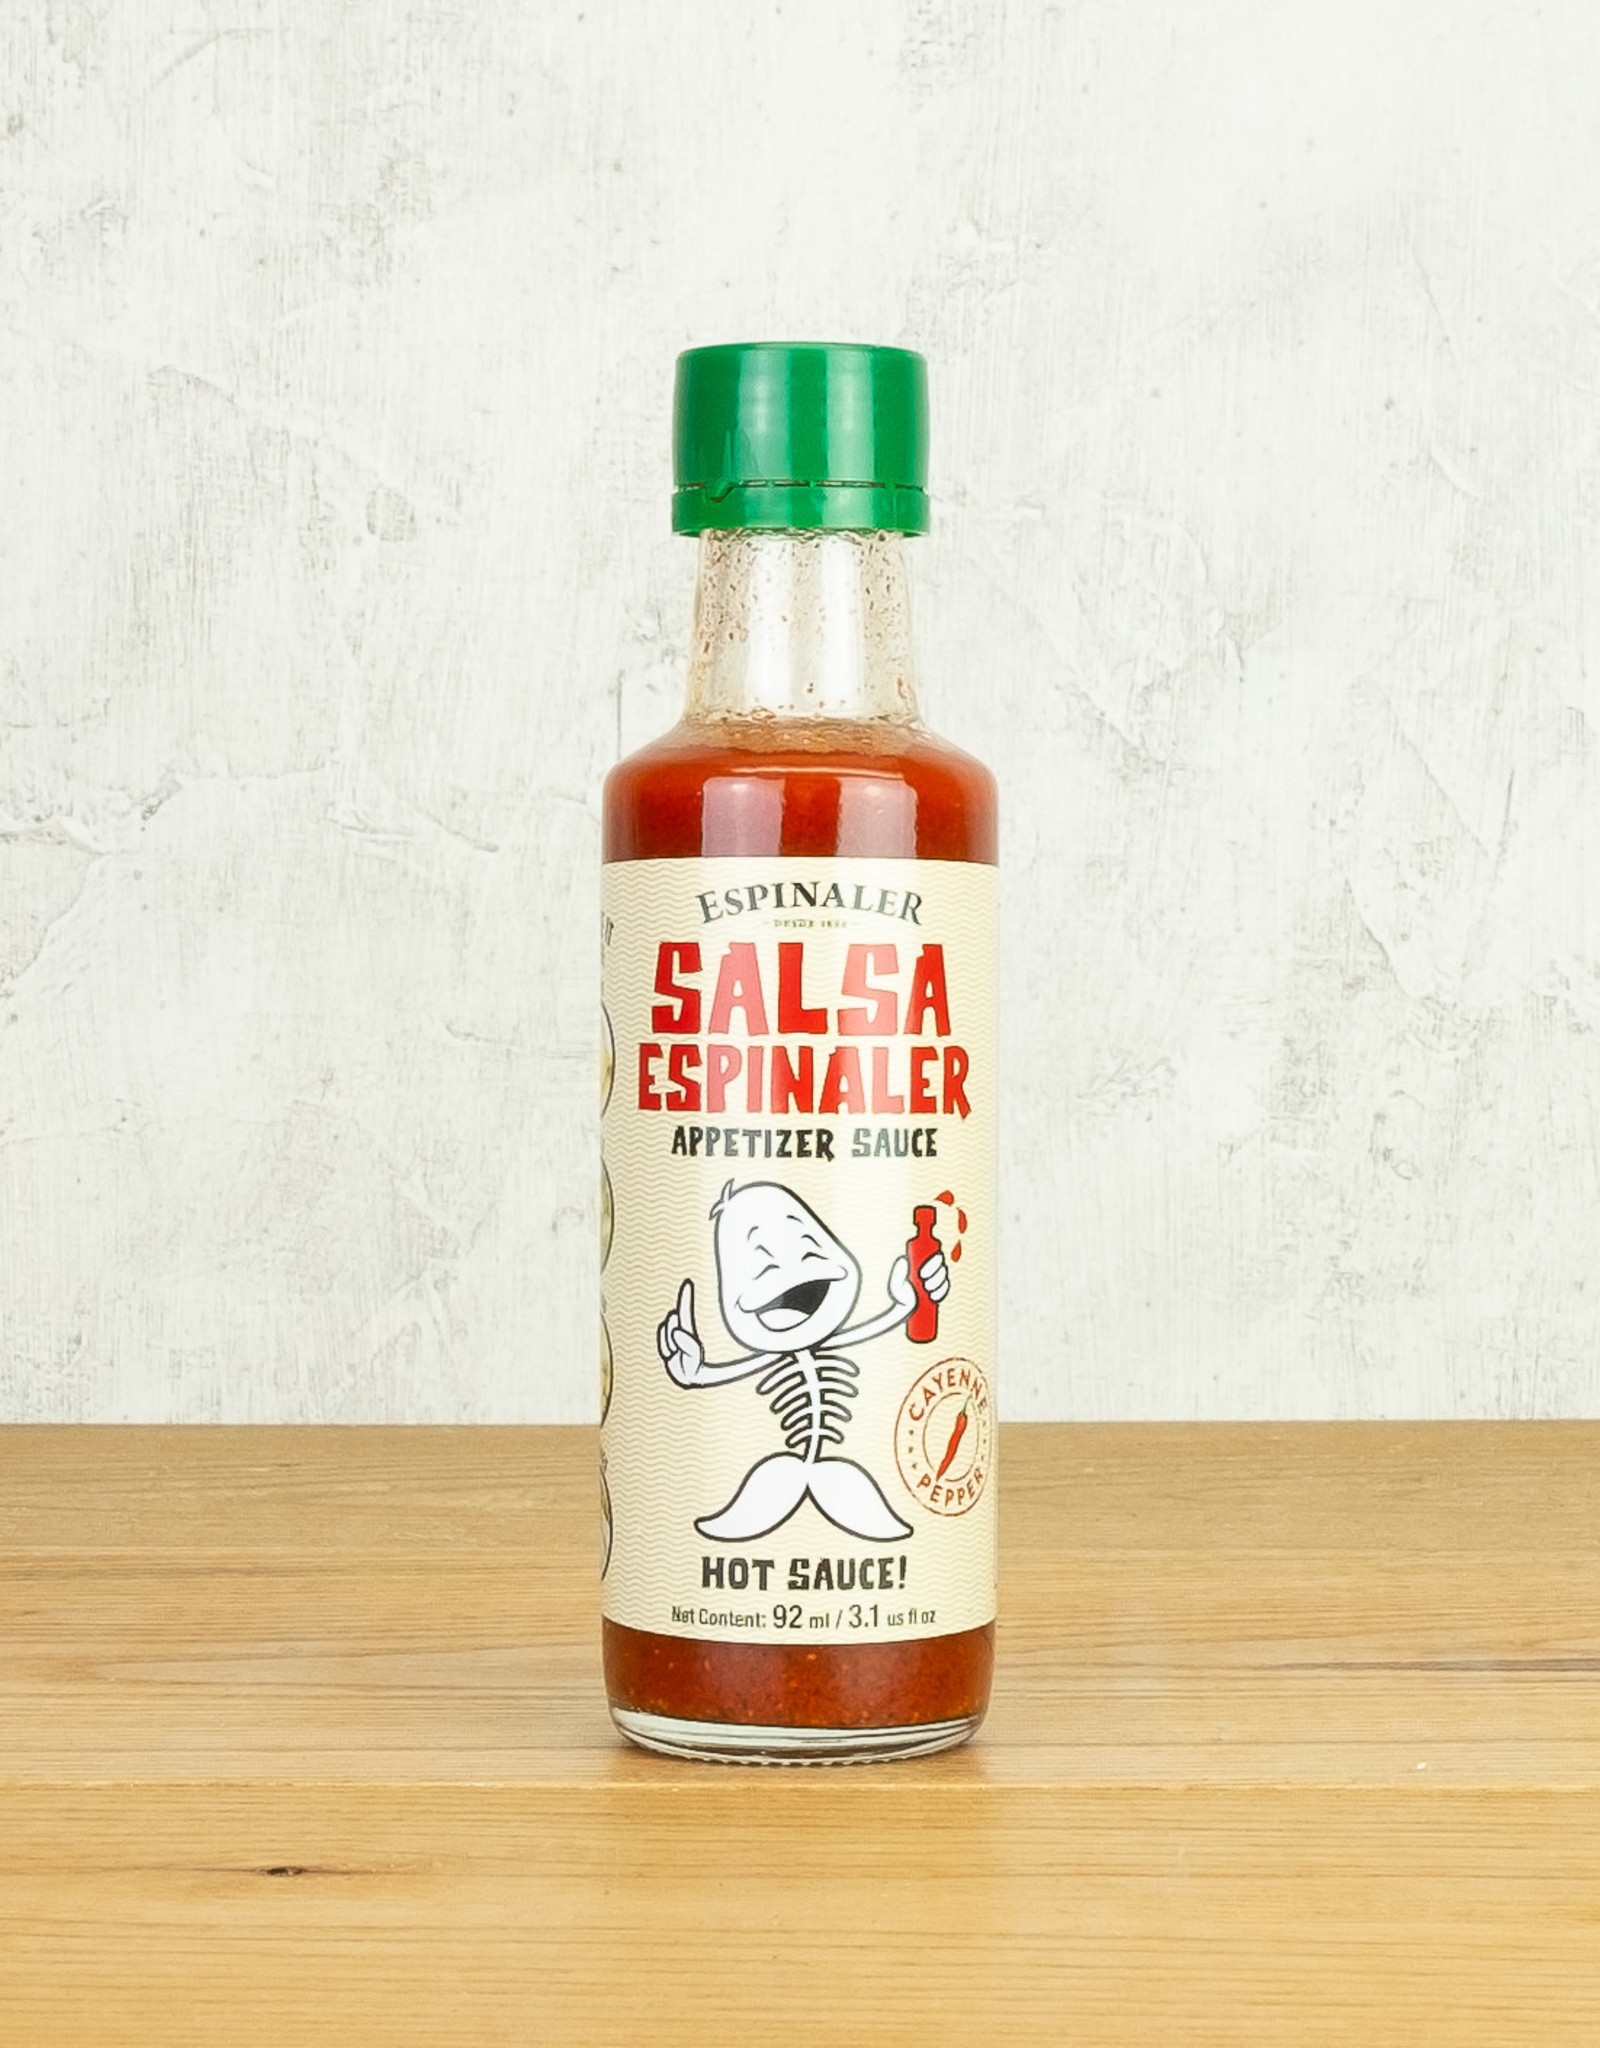 Salsa Espinaler Appetizer Hot Sauce